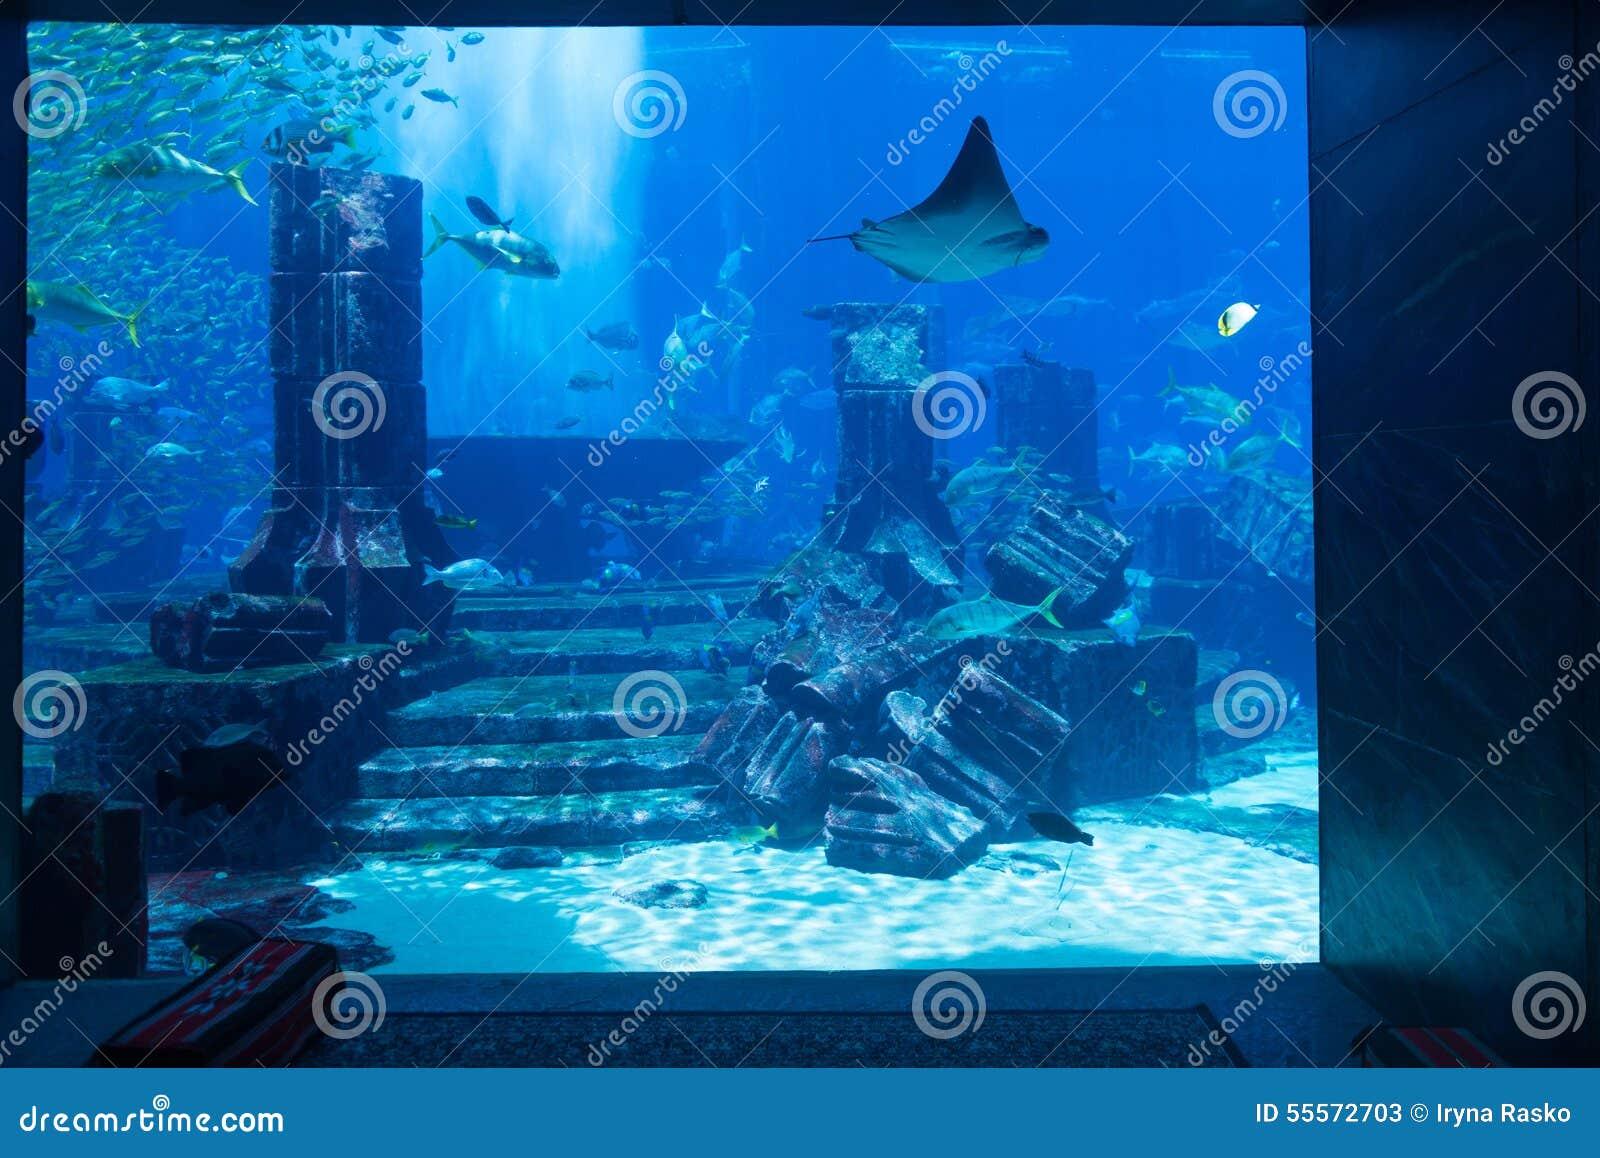 Atlantis Themed Public Aquarium Display With Realistic City Ruin Stock Photo - Image: 55572703